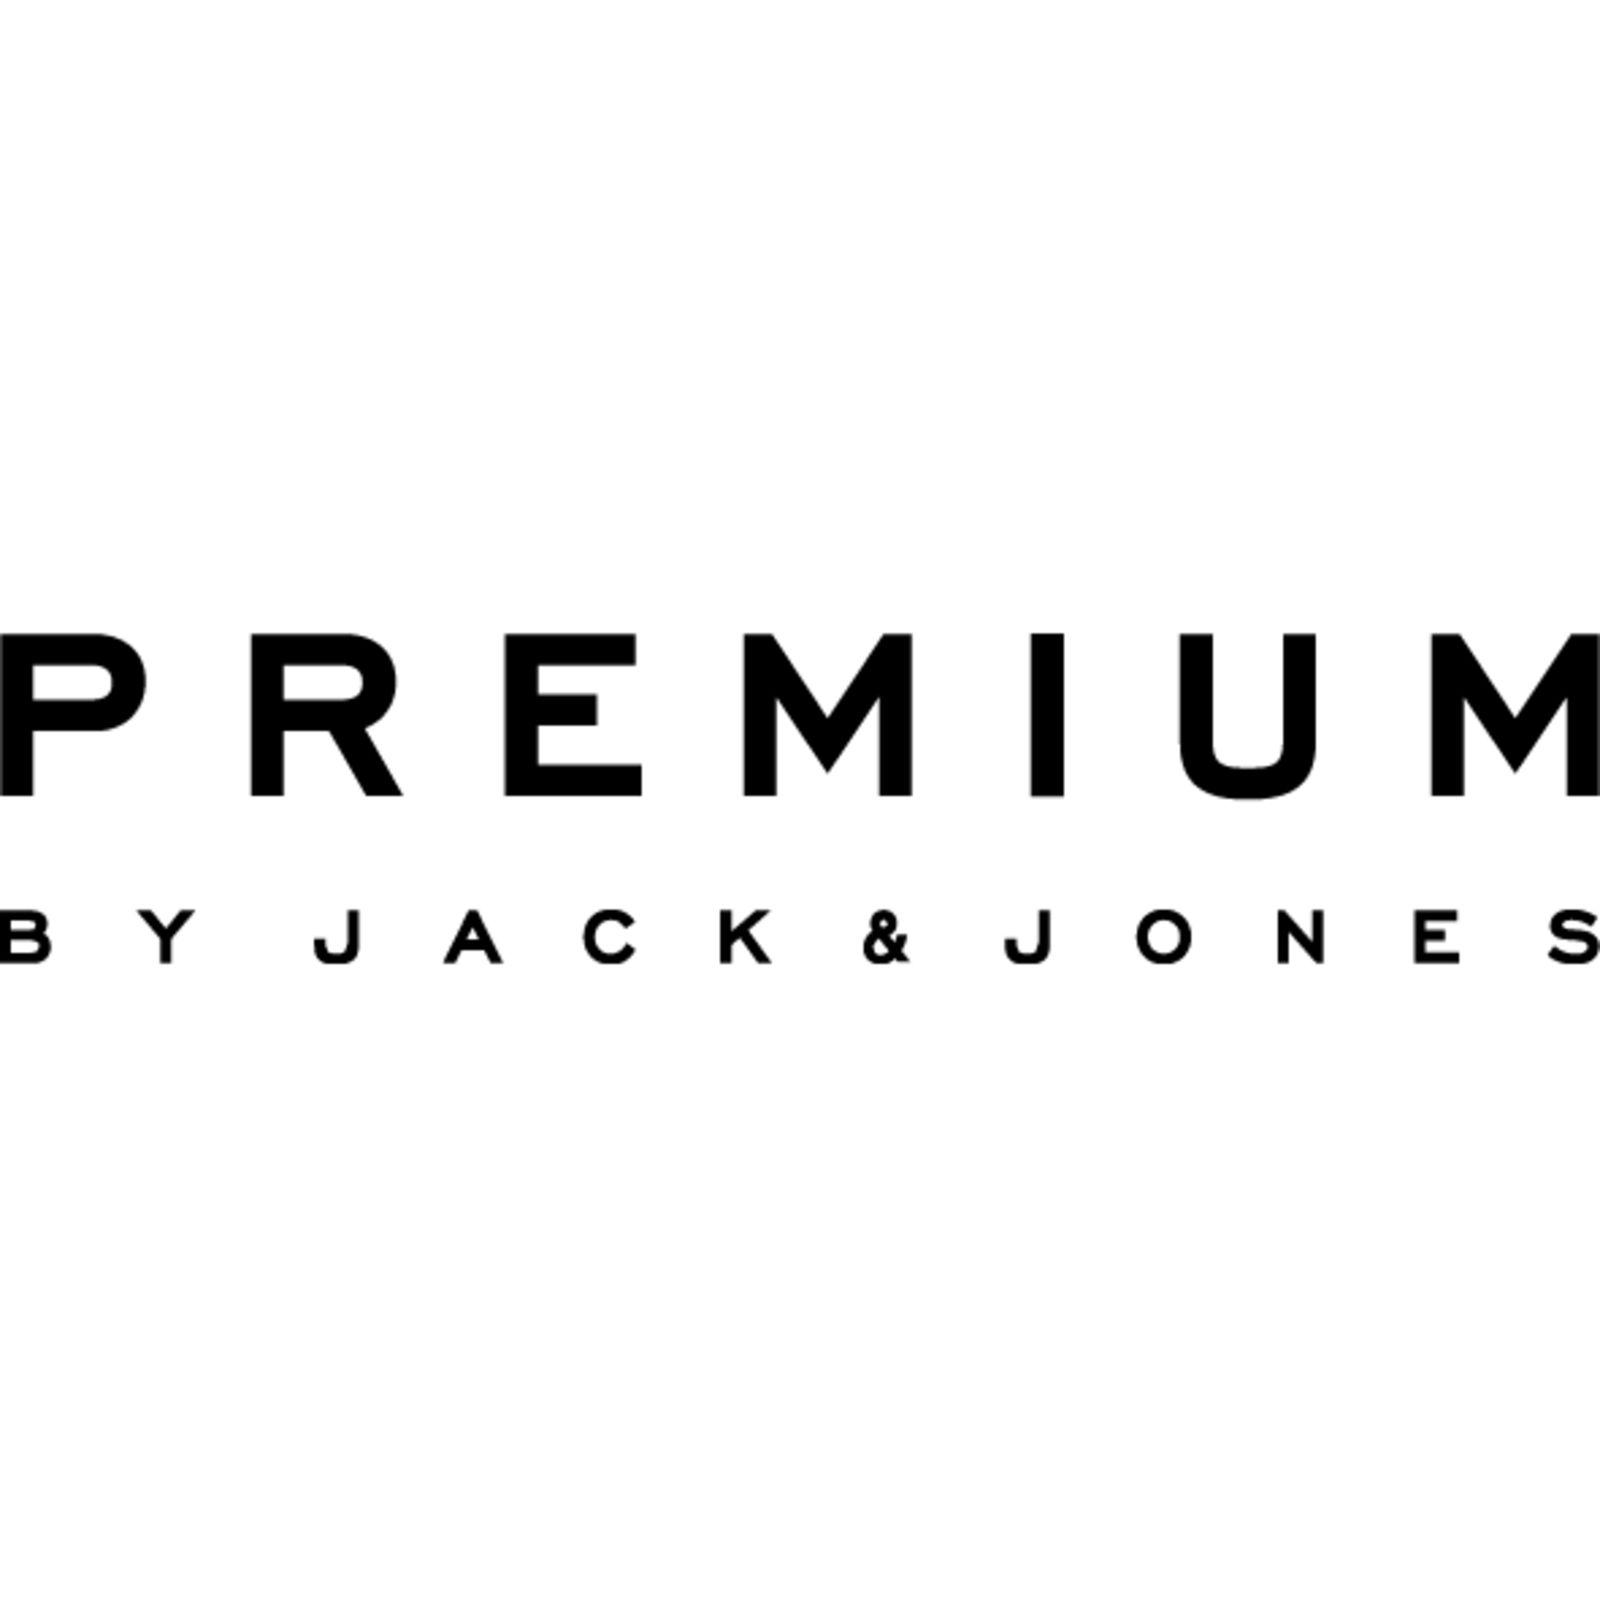 PREMIUM by JACK & JONES (Изображение 1)